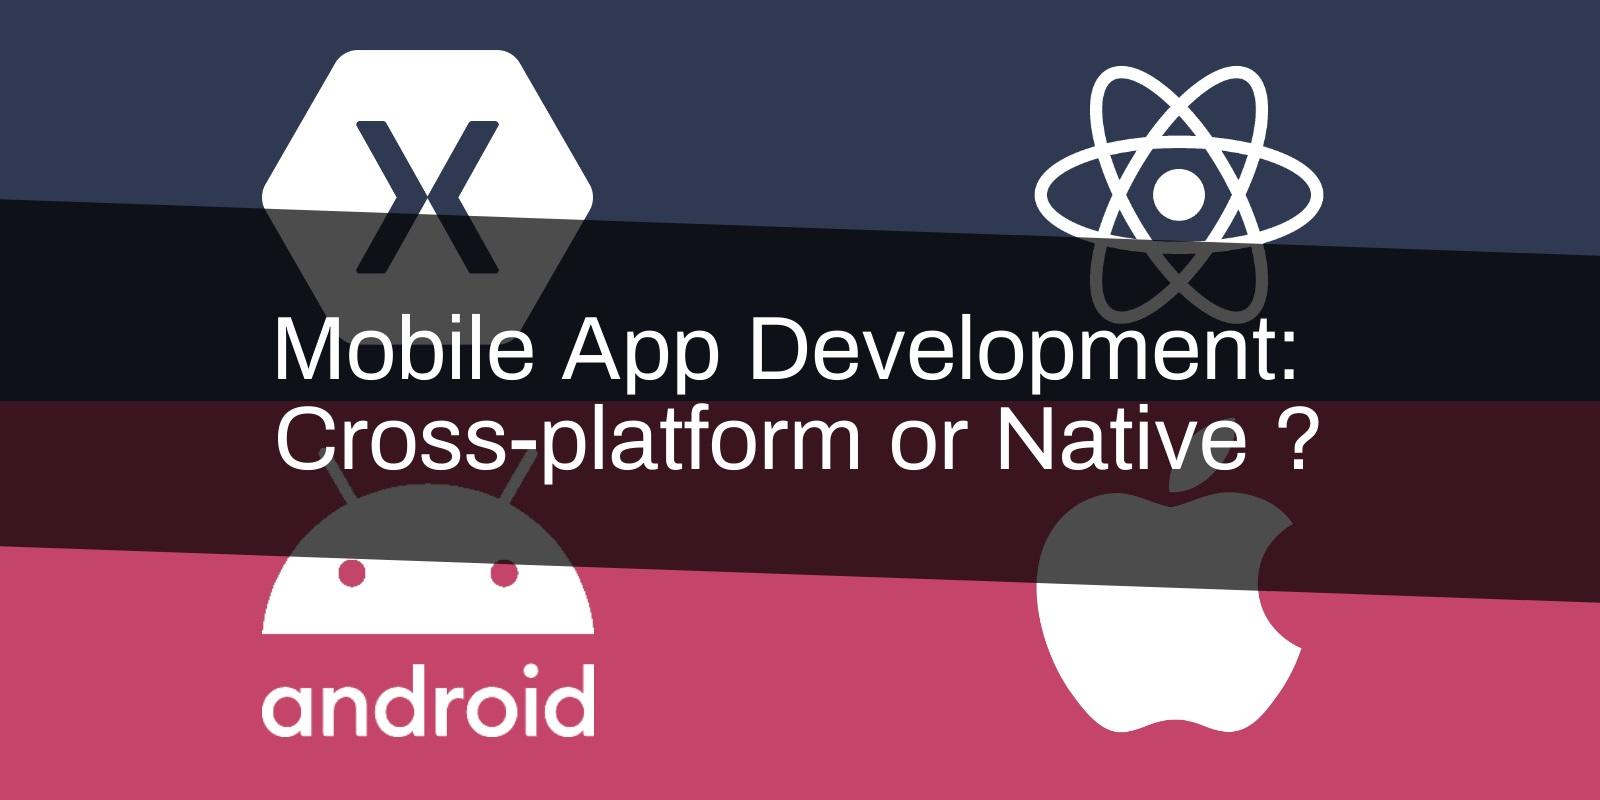 Cross-platform or Native Mobile App Development